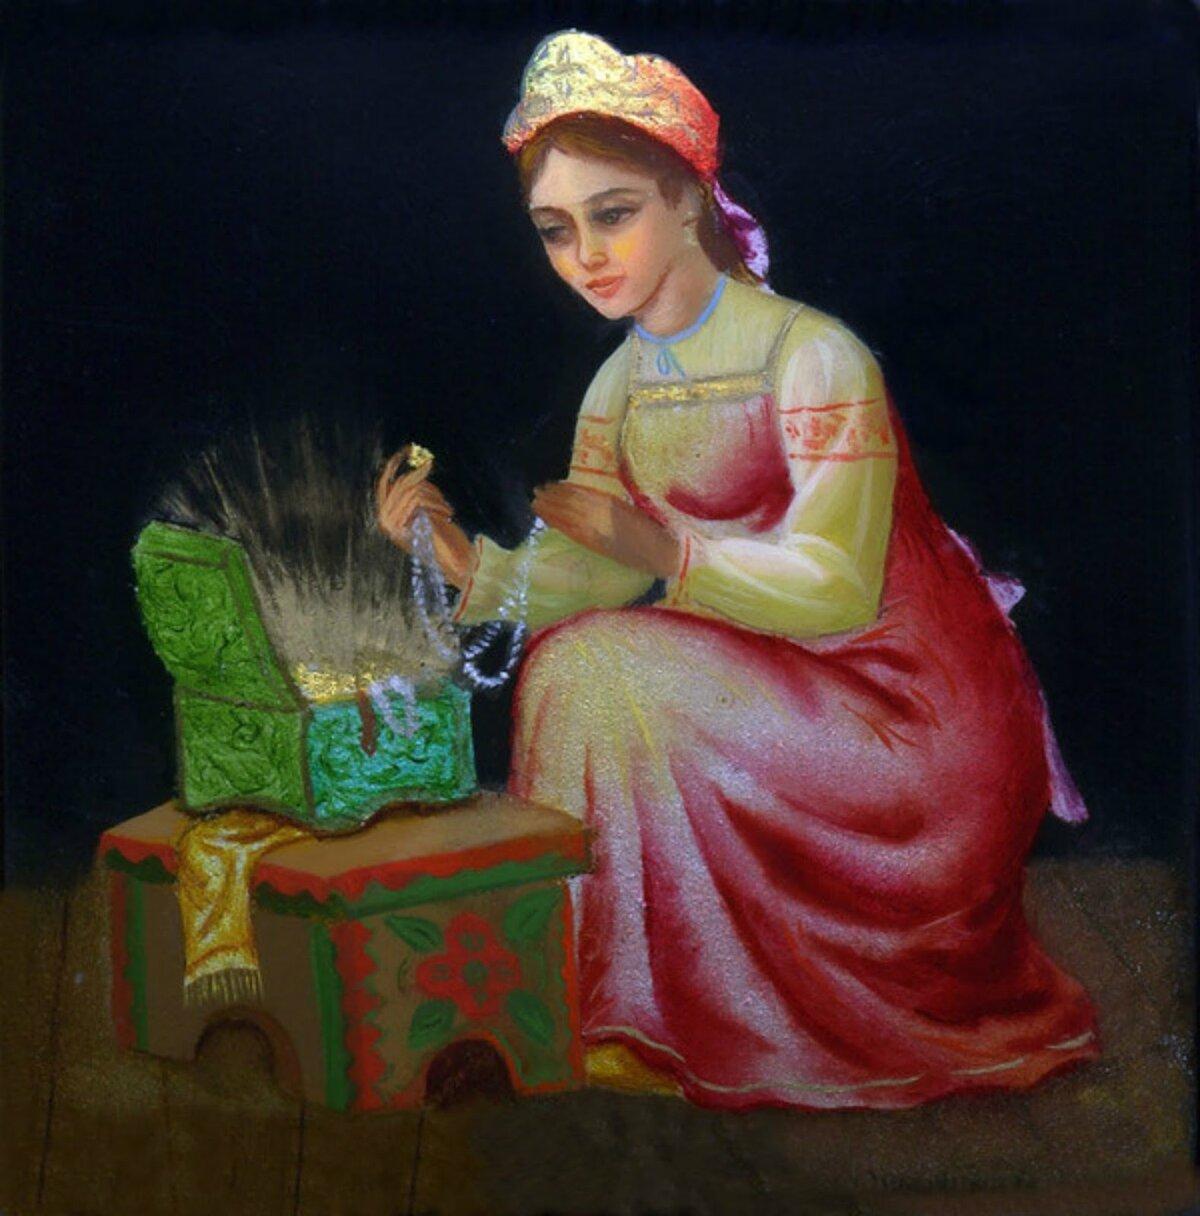 Картинки к сказкам бажова малахитовая шкатулка